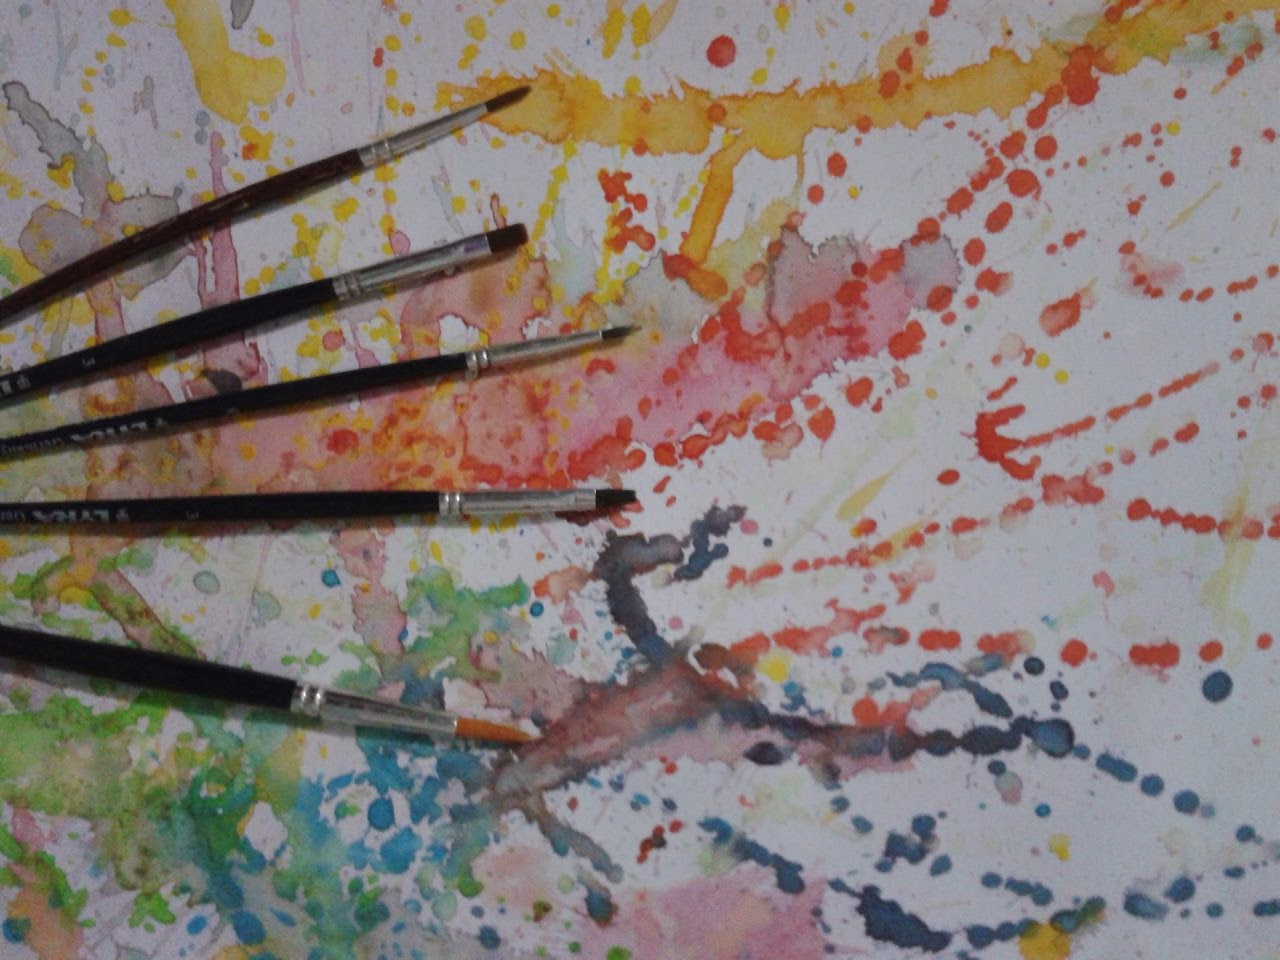 Lukisan Abstrak Hem: Tips-Tips Cara Melakukan Pendekatan Lukisan Abstrak